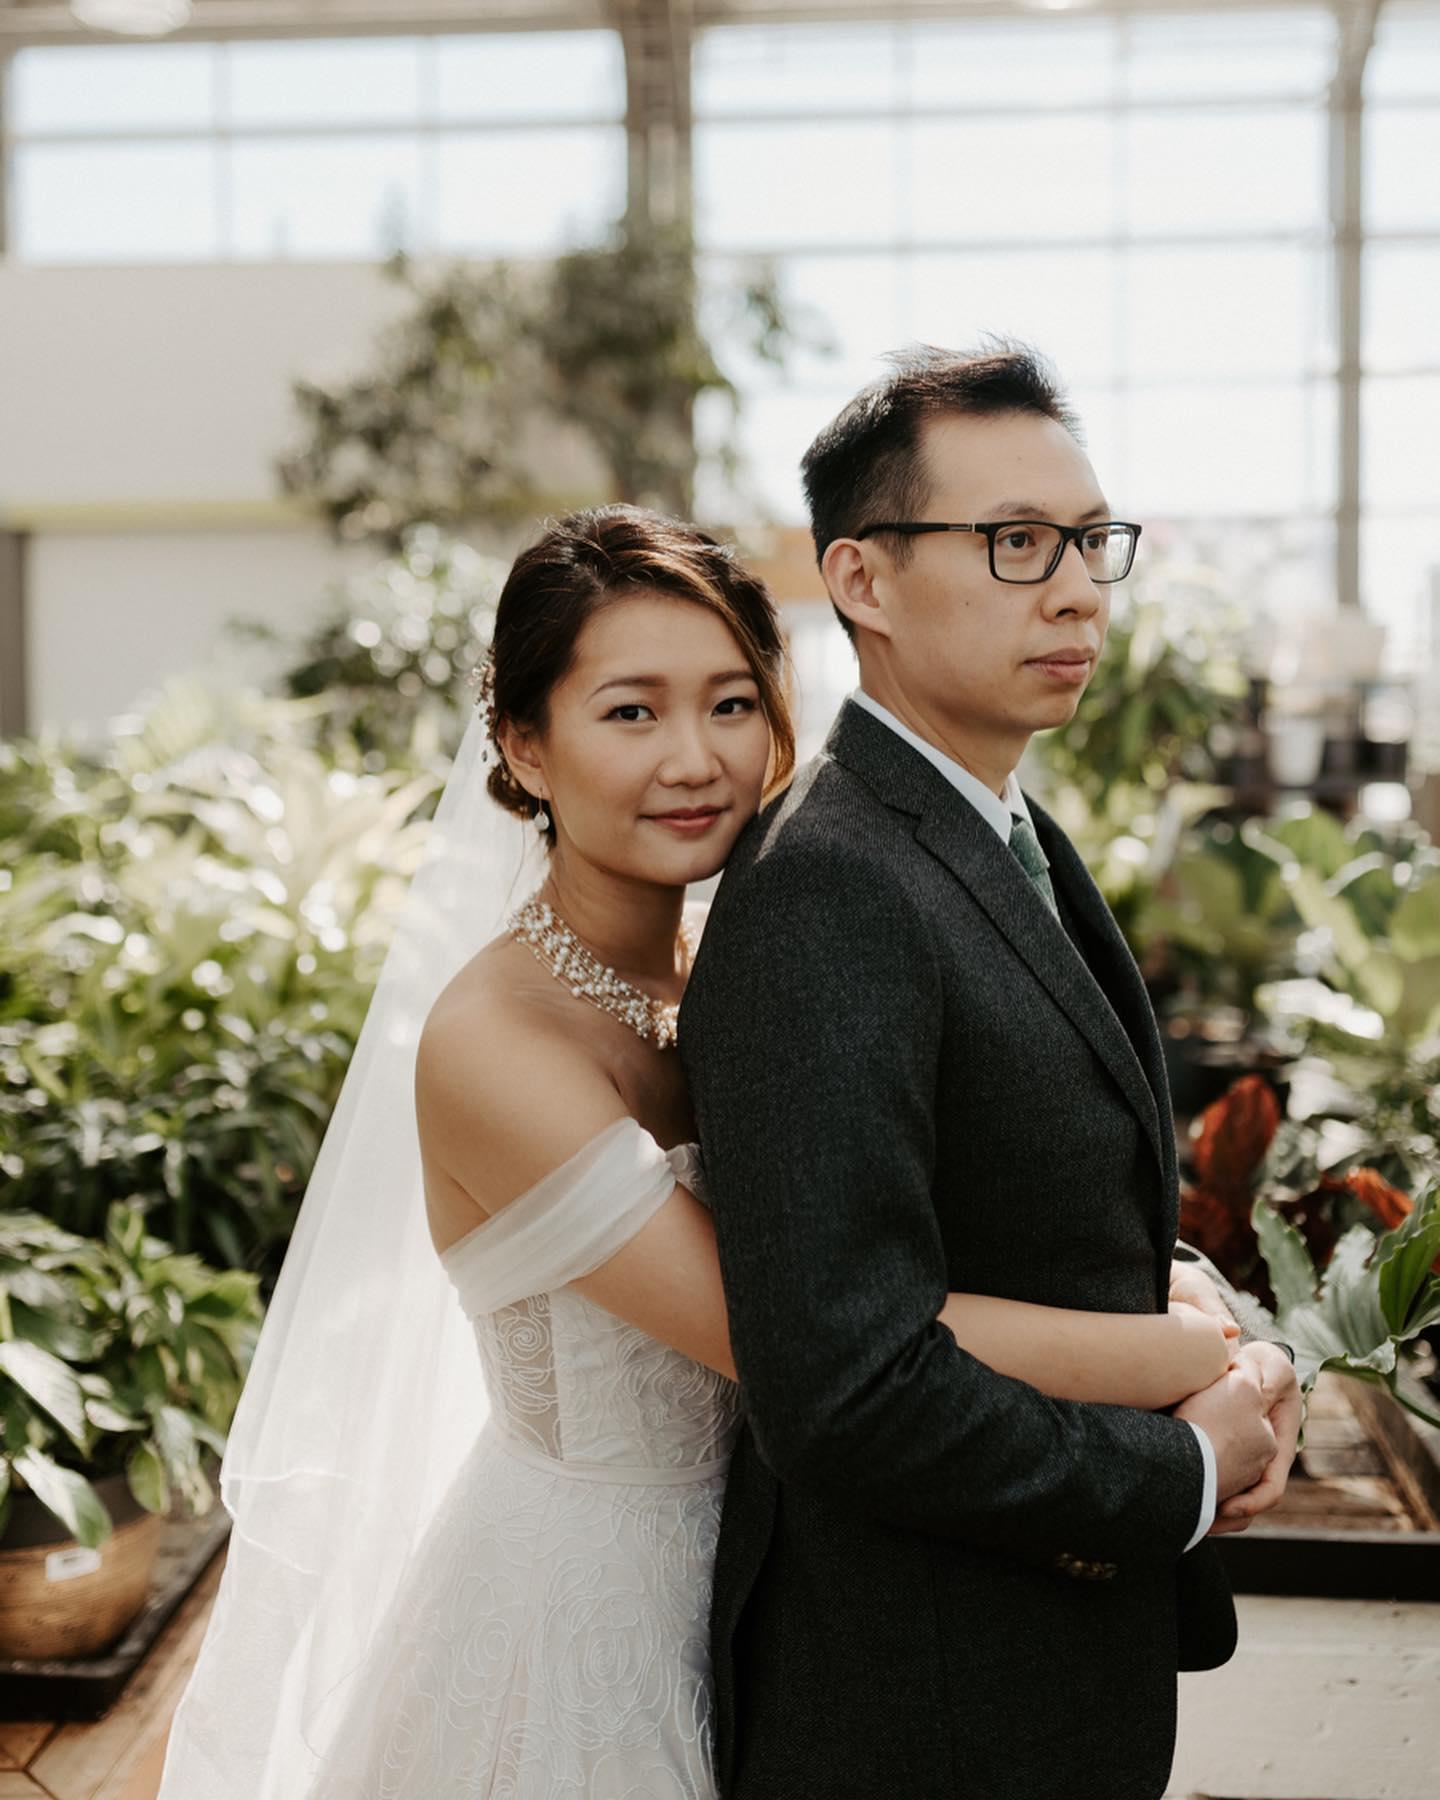 Molly Lin and Sing-Chi Lam